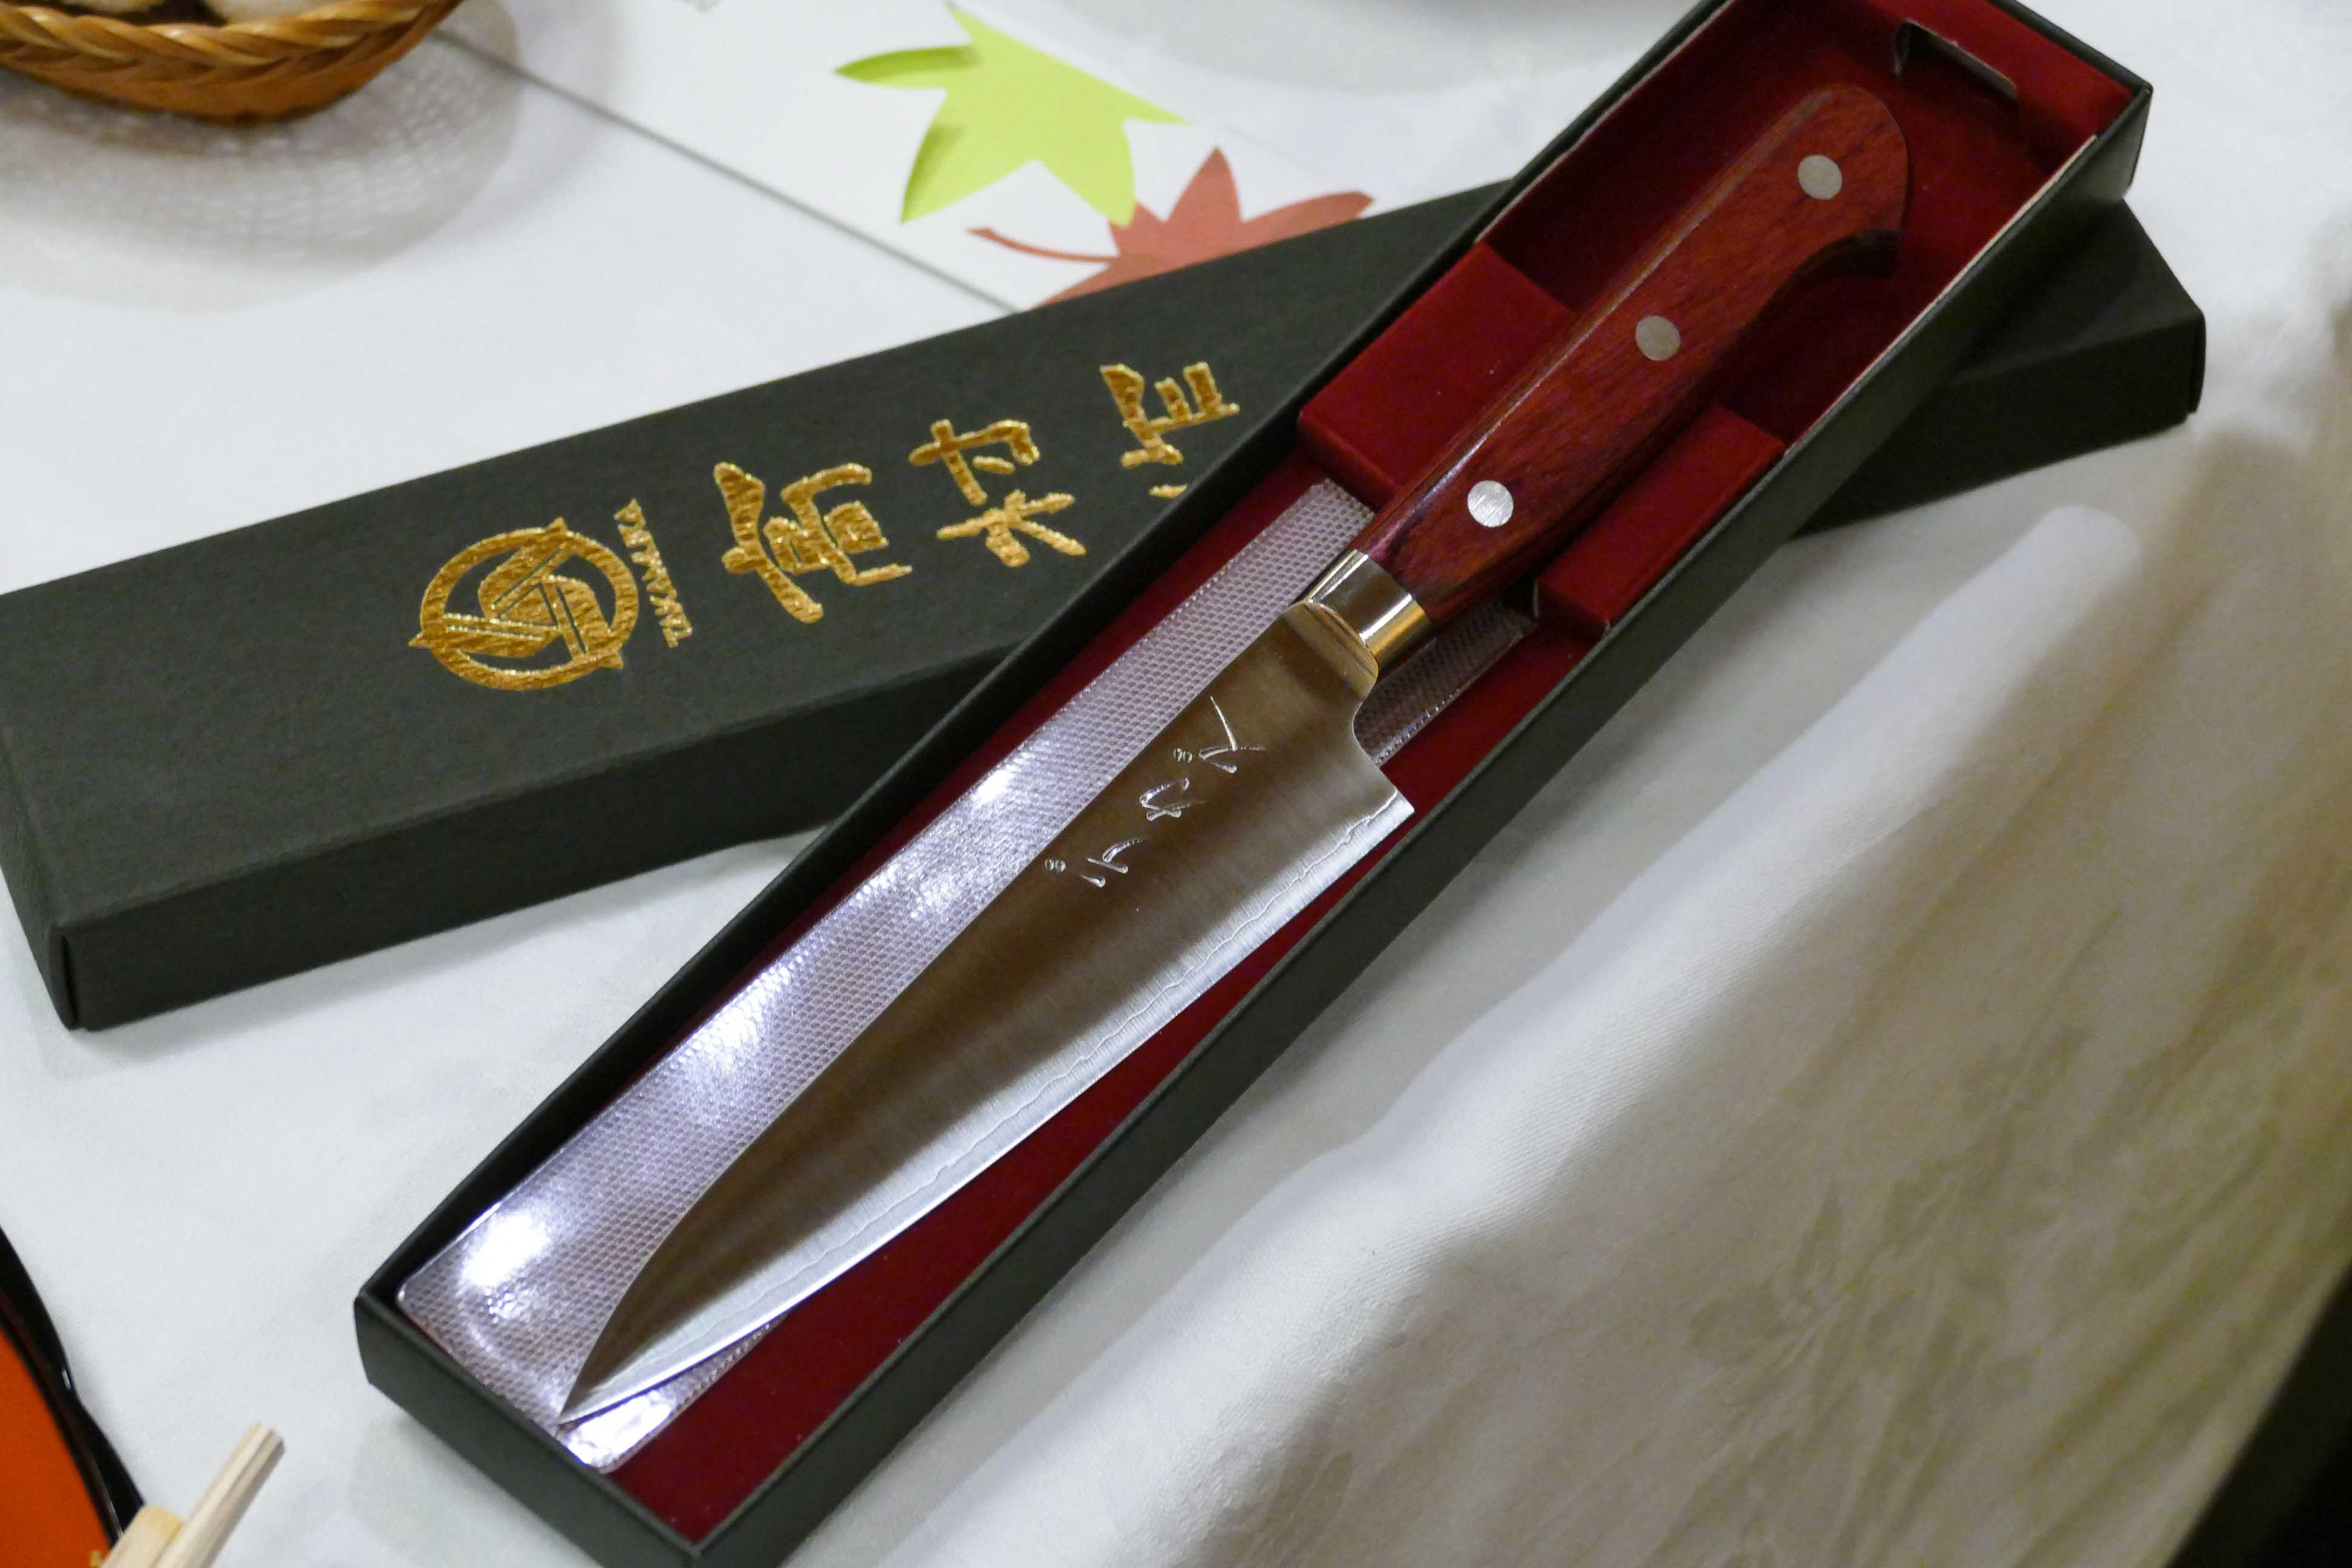 Couteaux japonais Takamura - Gault & Millau Tour Hokuriku [ Japon ] - Fukui